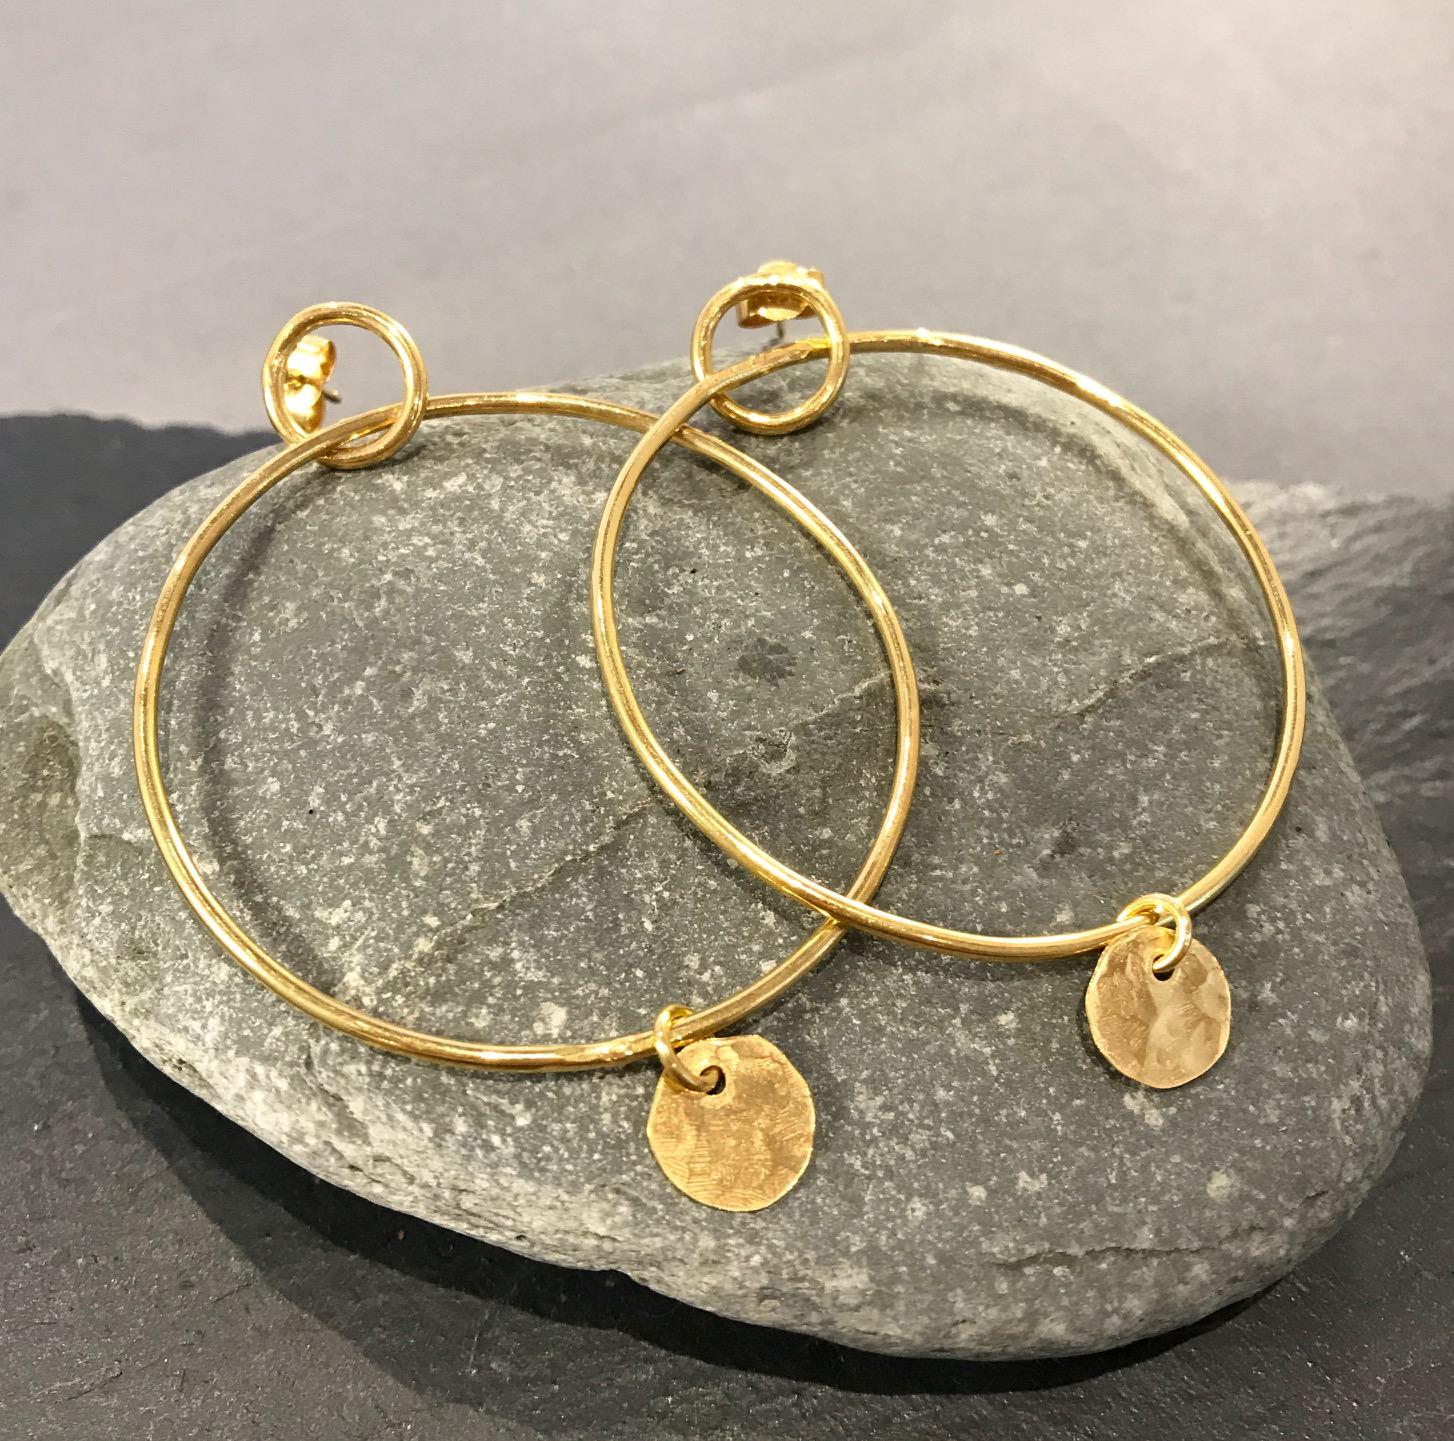 Meldon Hoops in Gold, handmade by devon jeweller Chloe Brooks-Warner